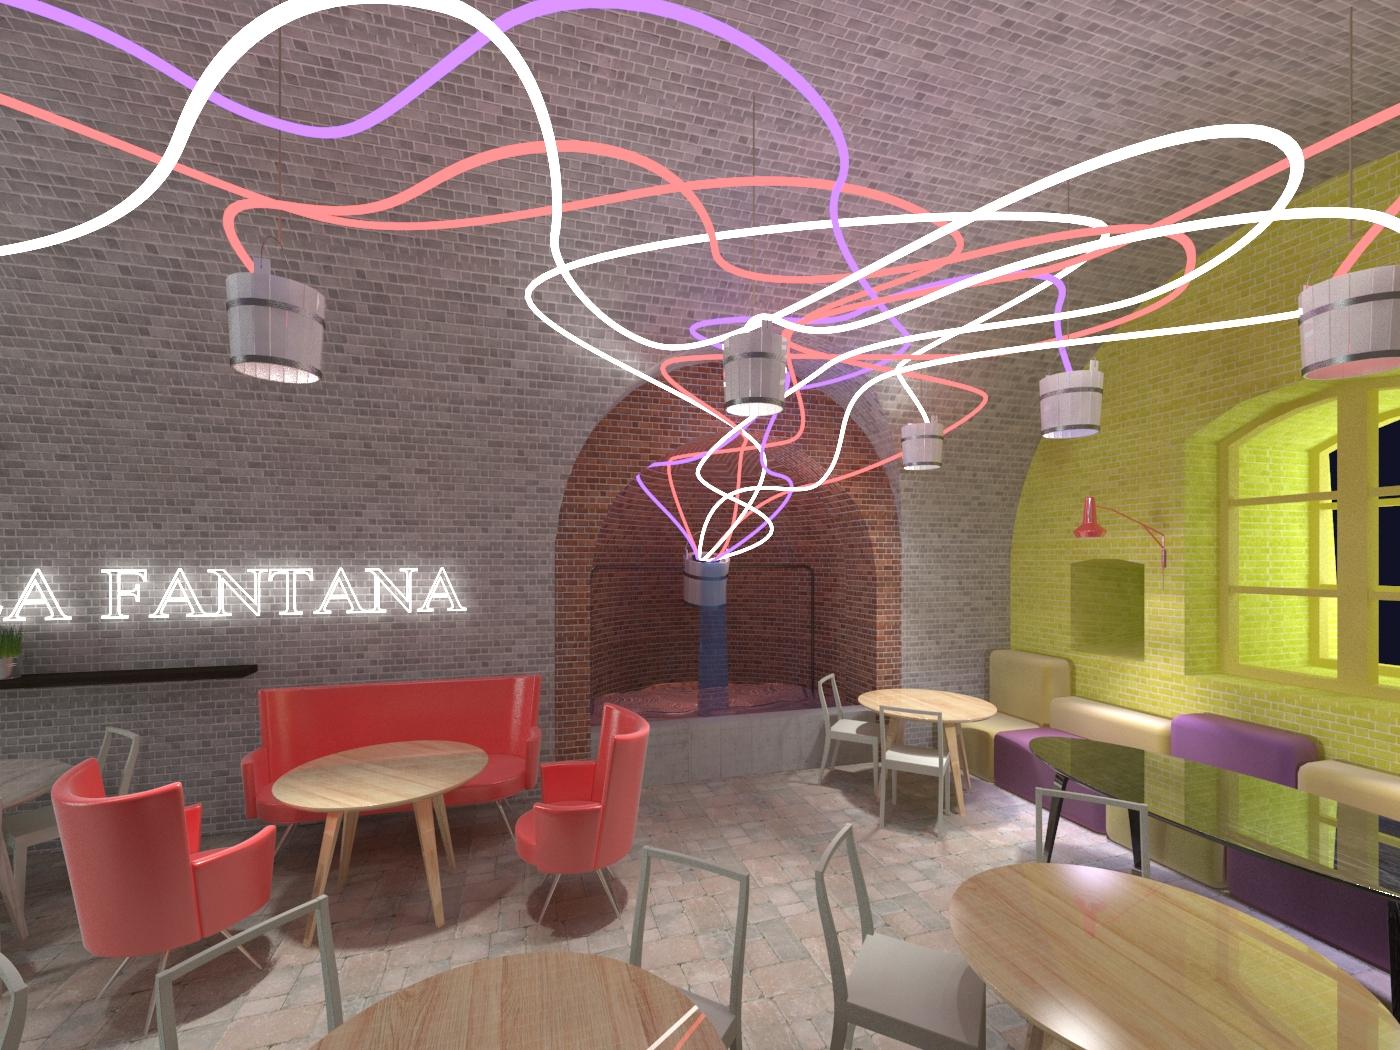 https://nbc-arhitect.ro/wp-content/uploads/2020/10/NBC-Arhitect-_-Ryma-Club-_-Alba-Iulia-Romania-_-interior-design-view_3.jpg